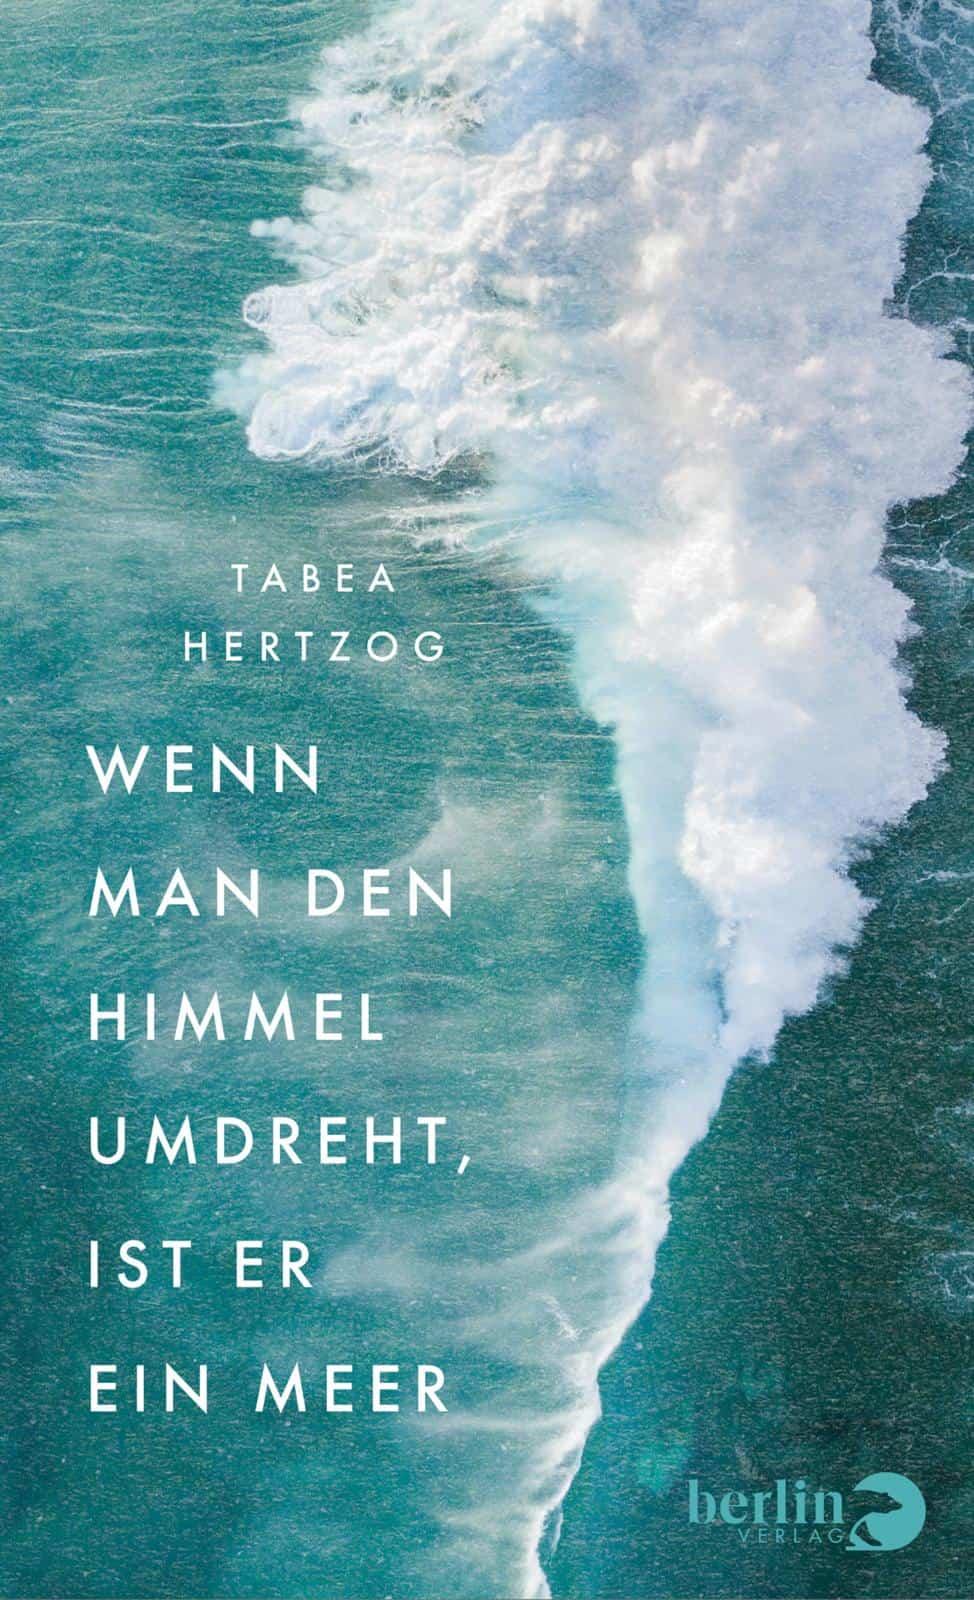 Tabea Hertzog